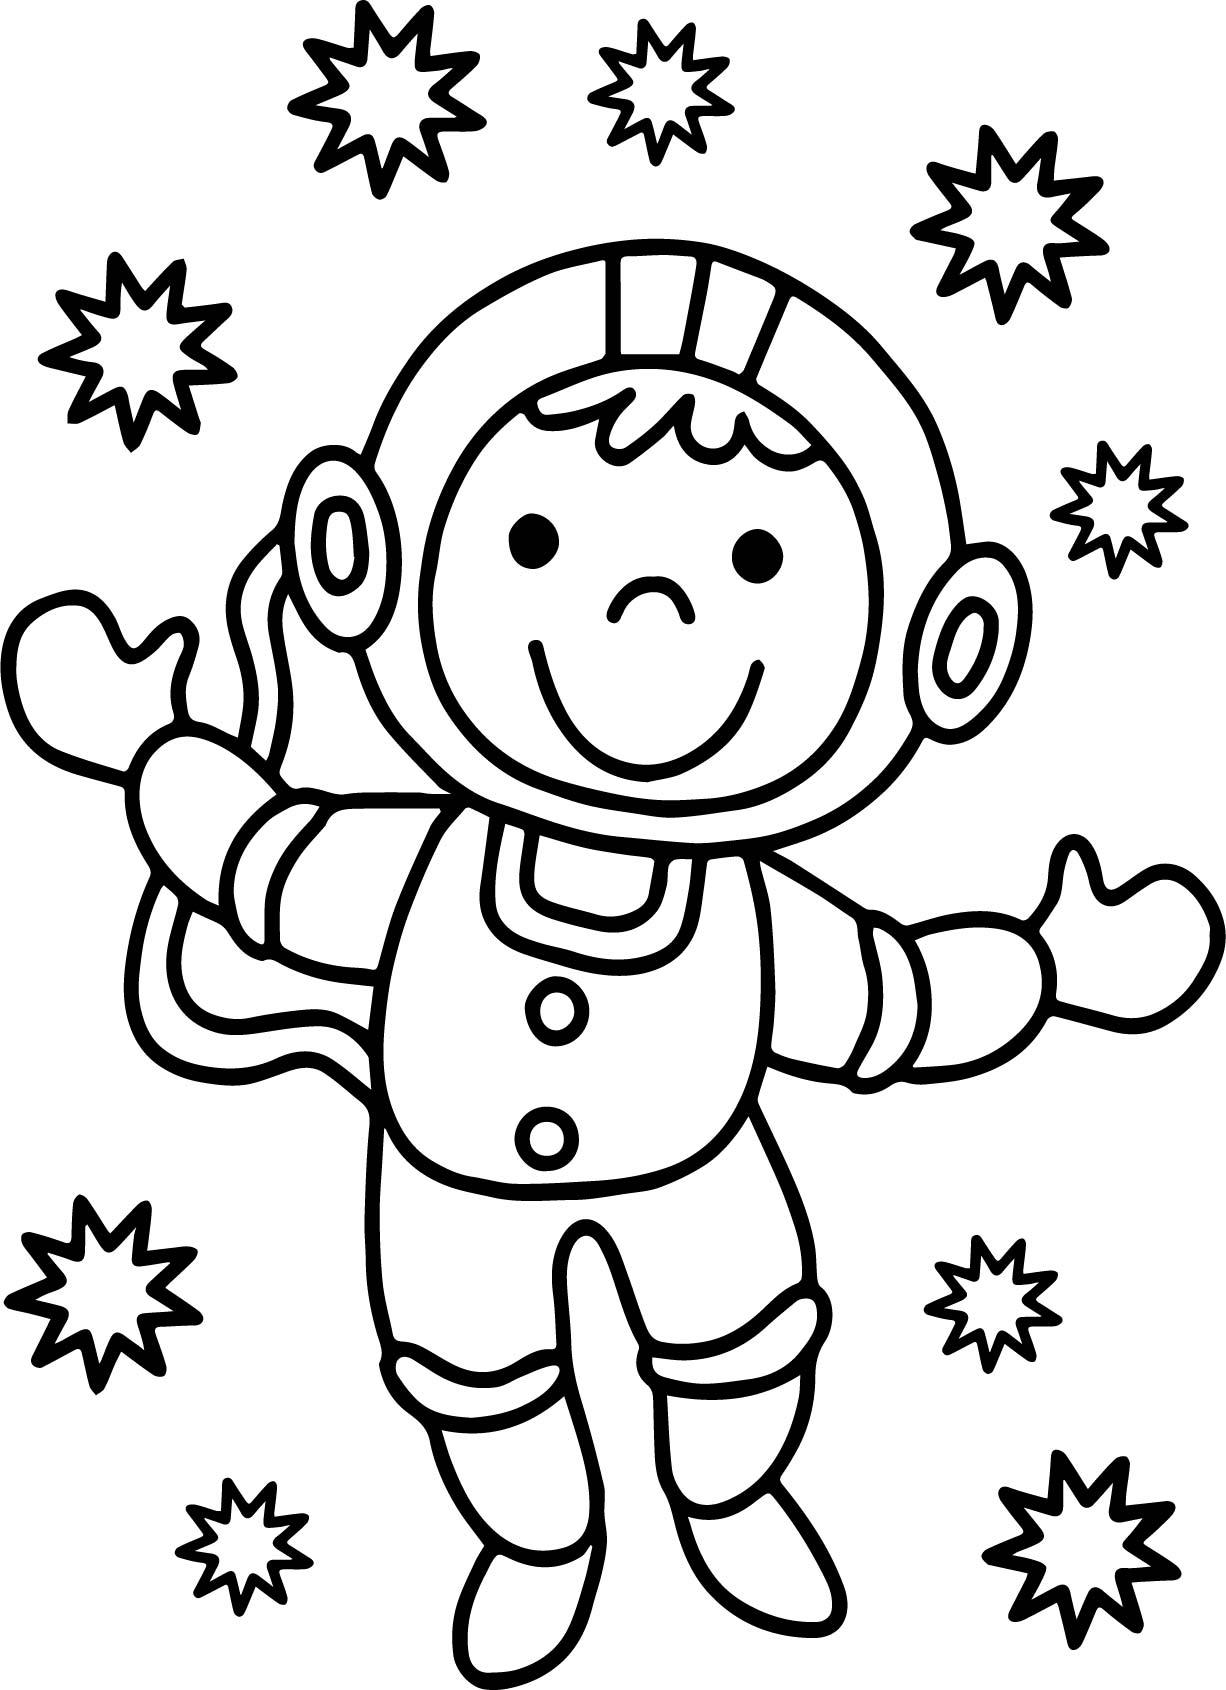 free astronaut printables - HD1226×1690